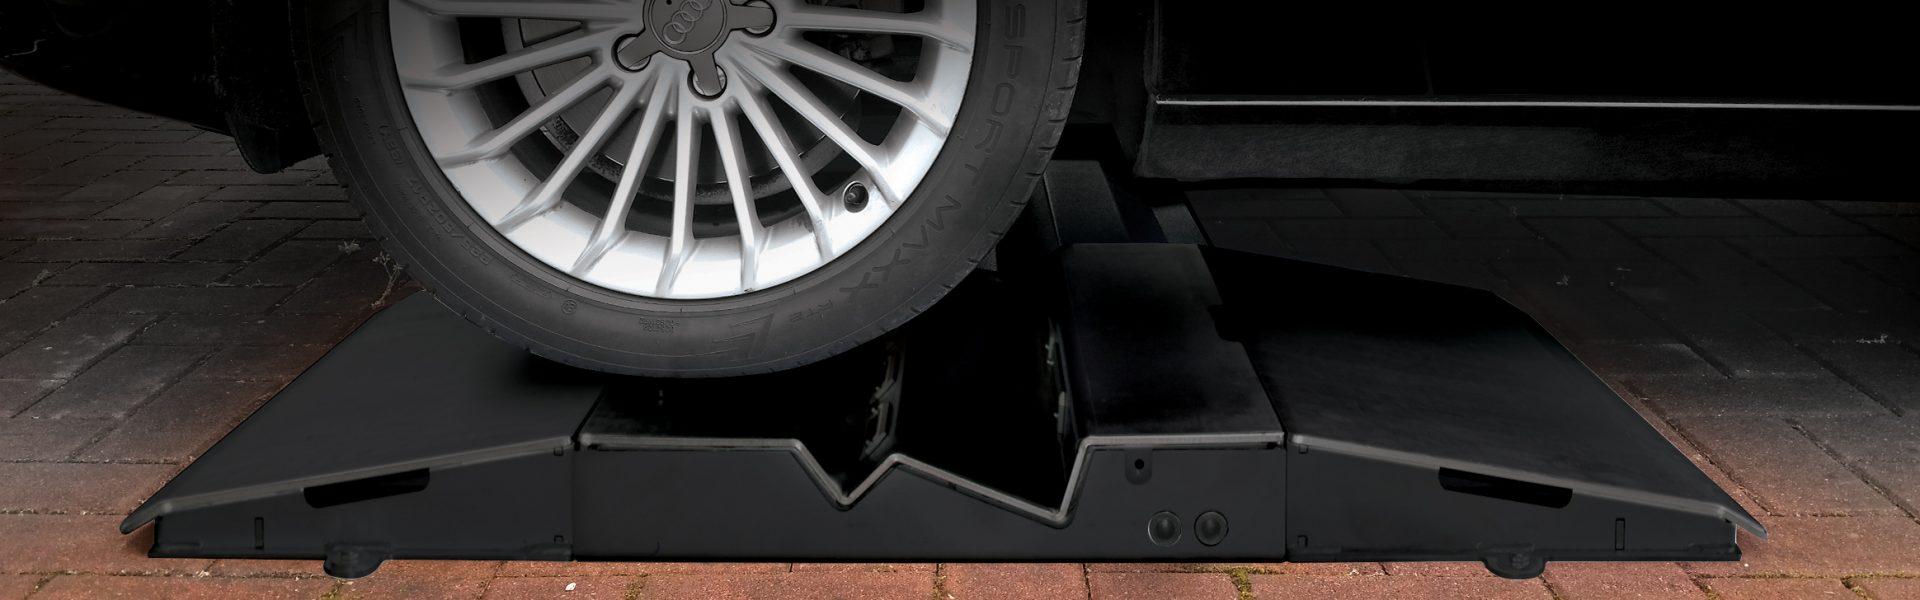 tyre-profiler space